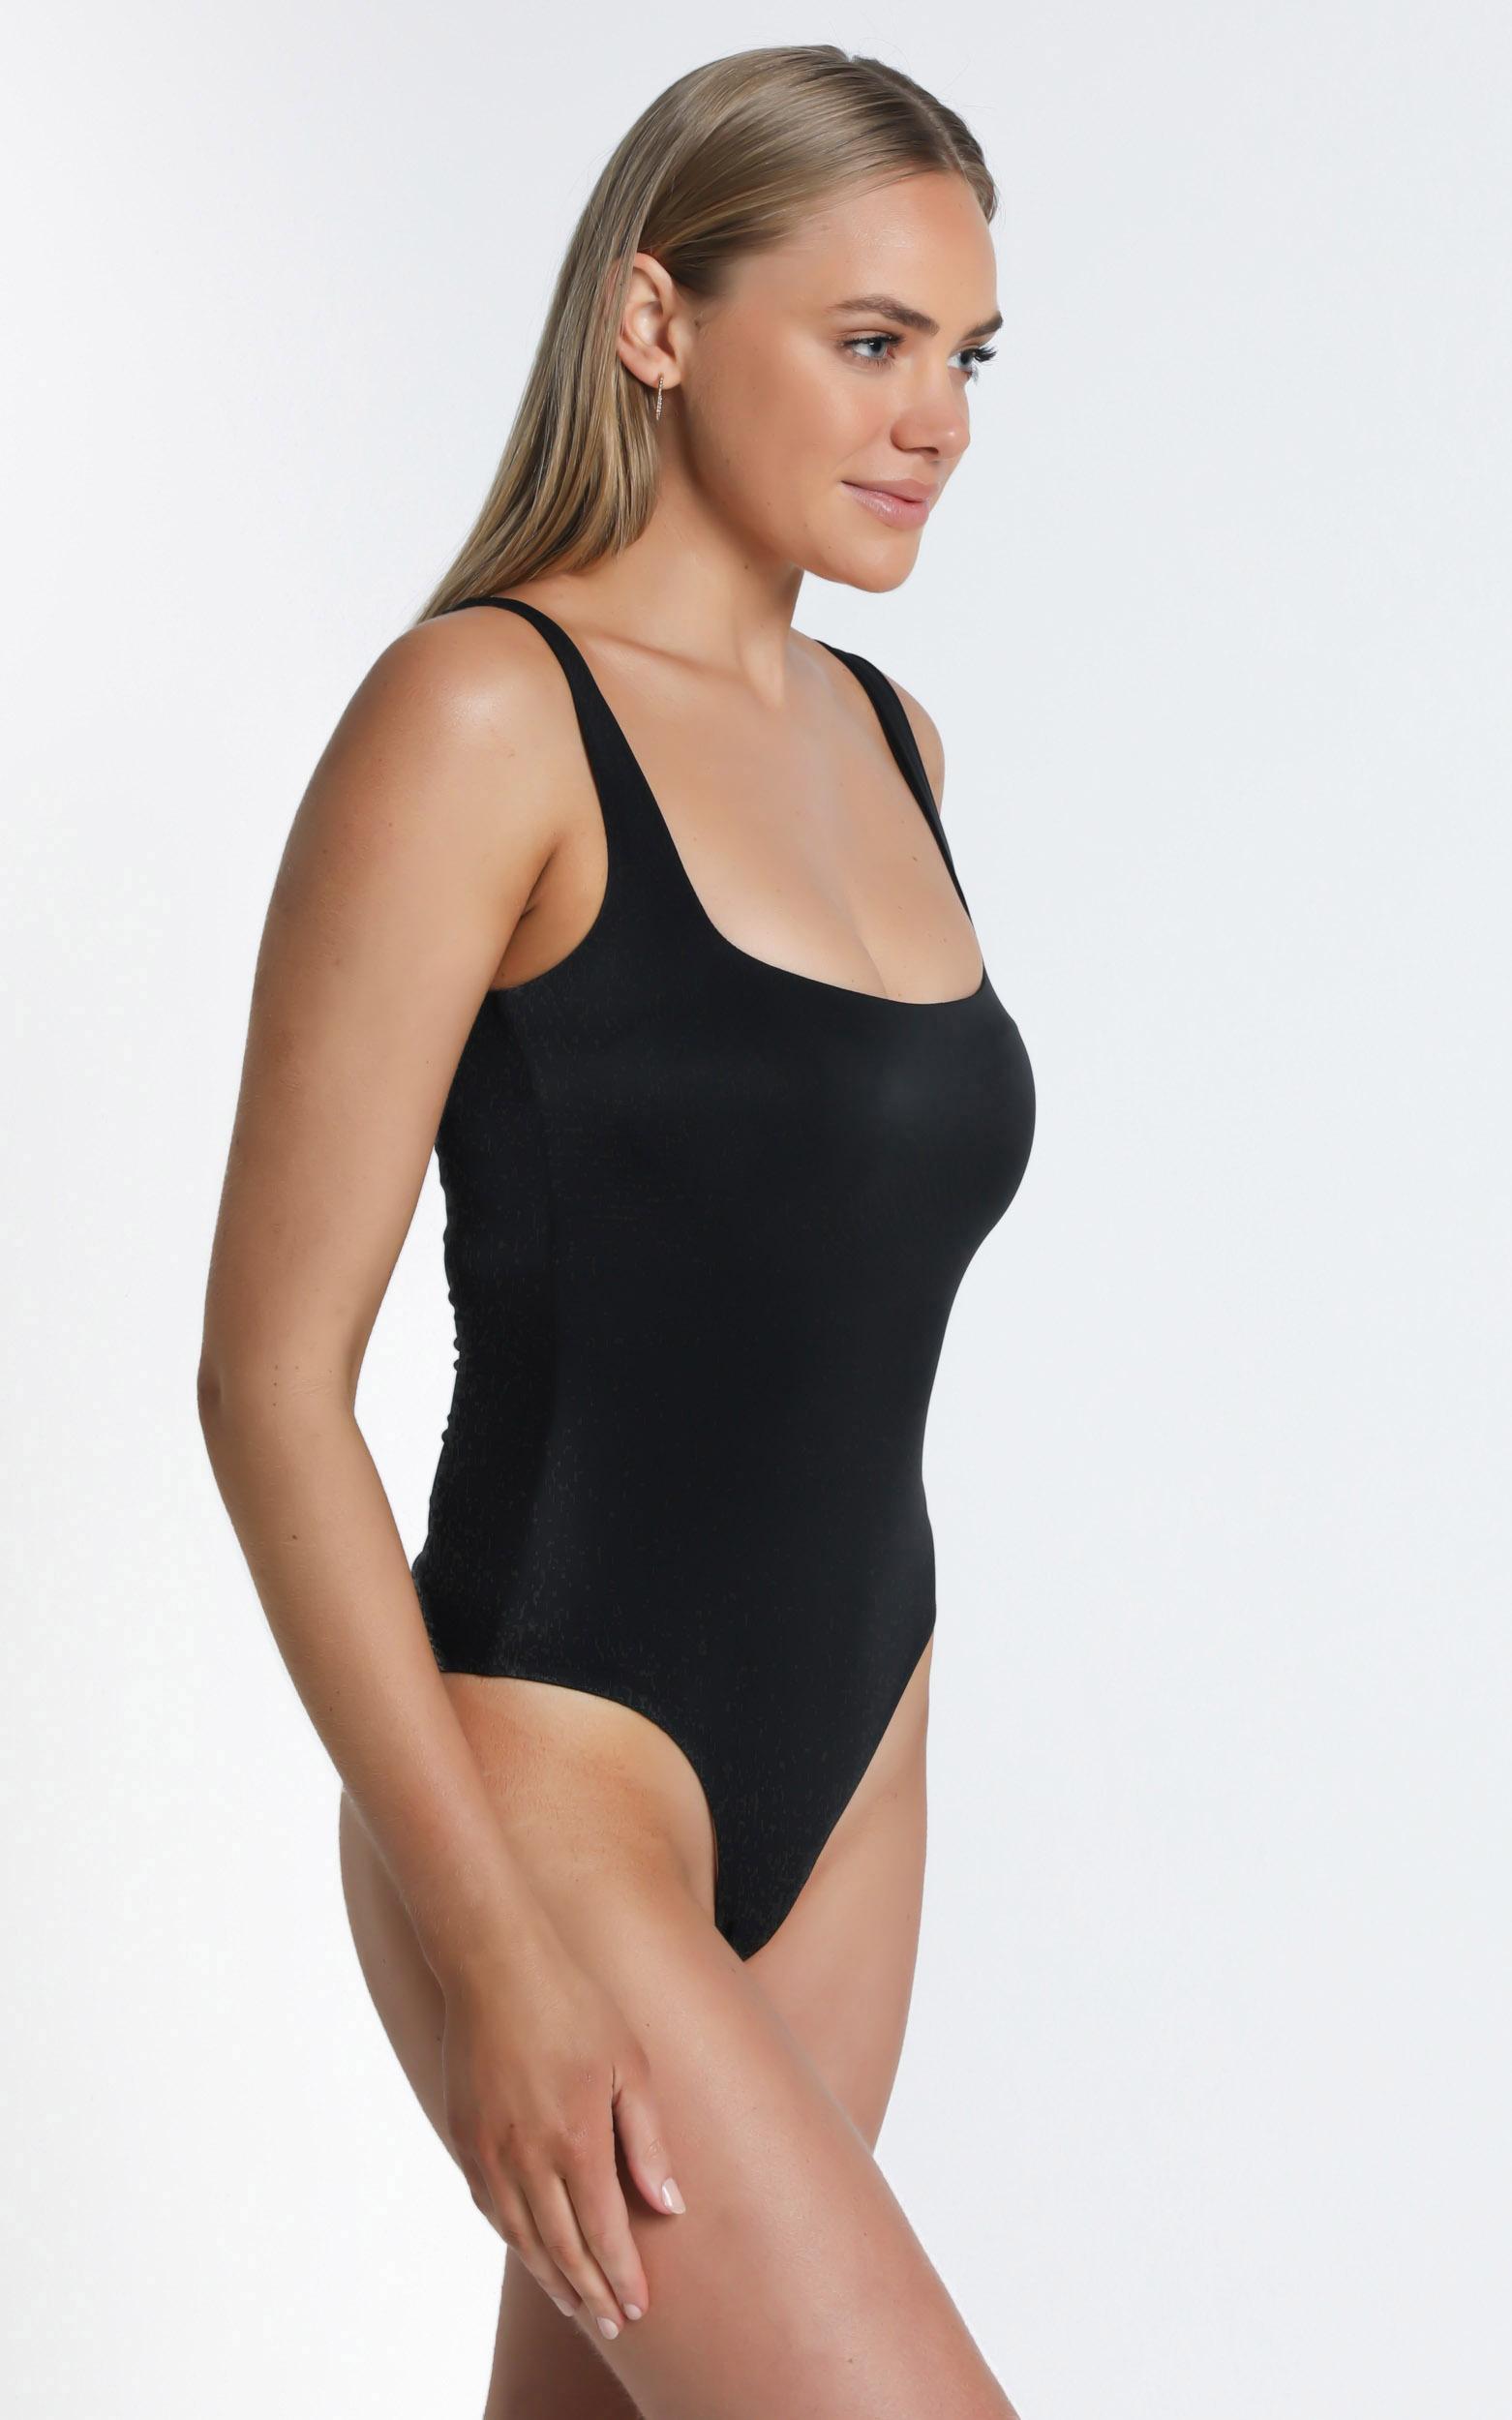 Blake Bodysuit In Black - 14 (XL), Black, hi-res image number null